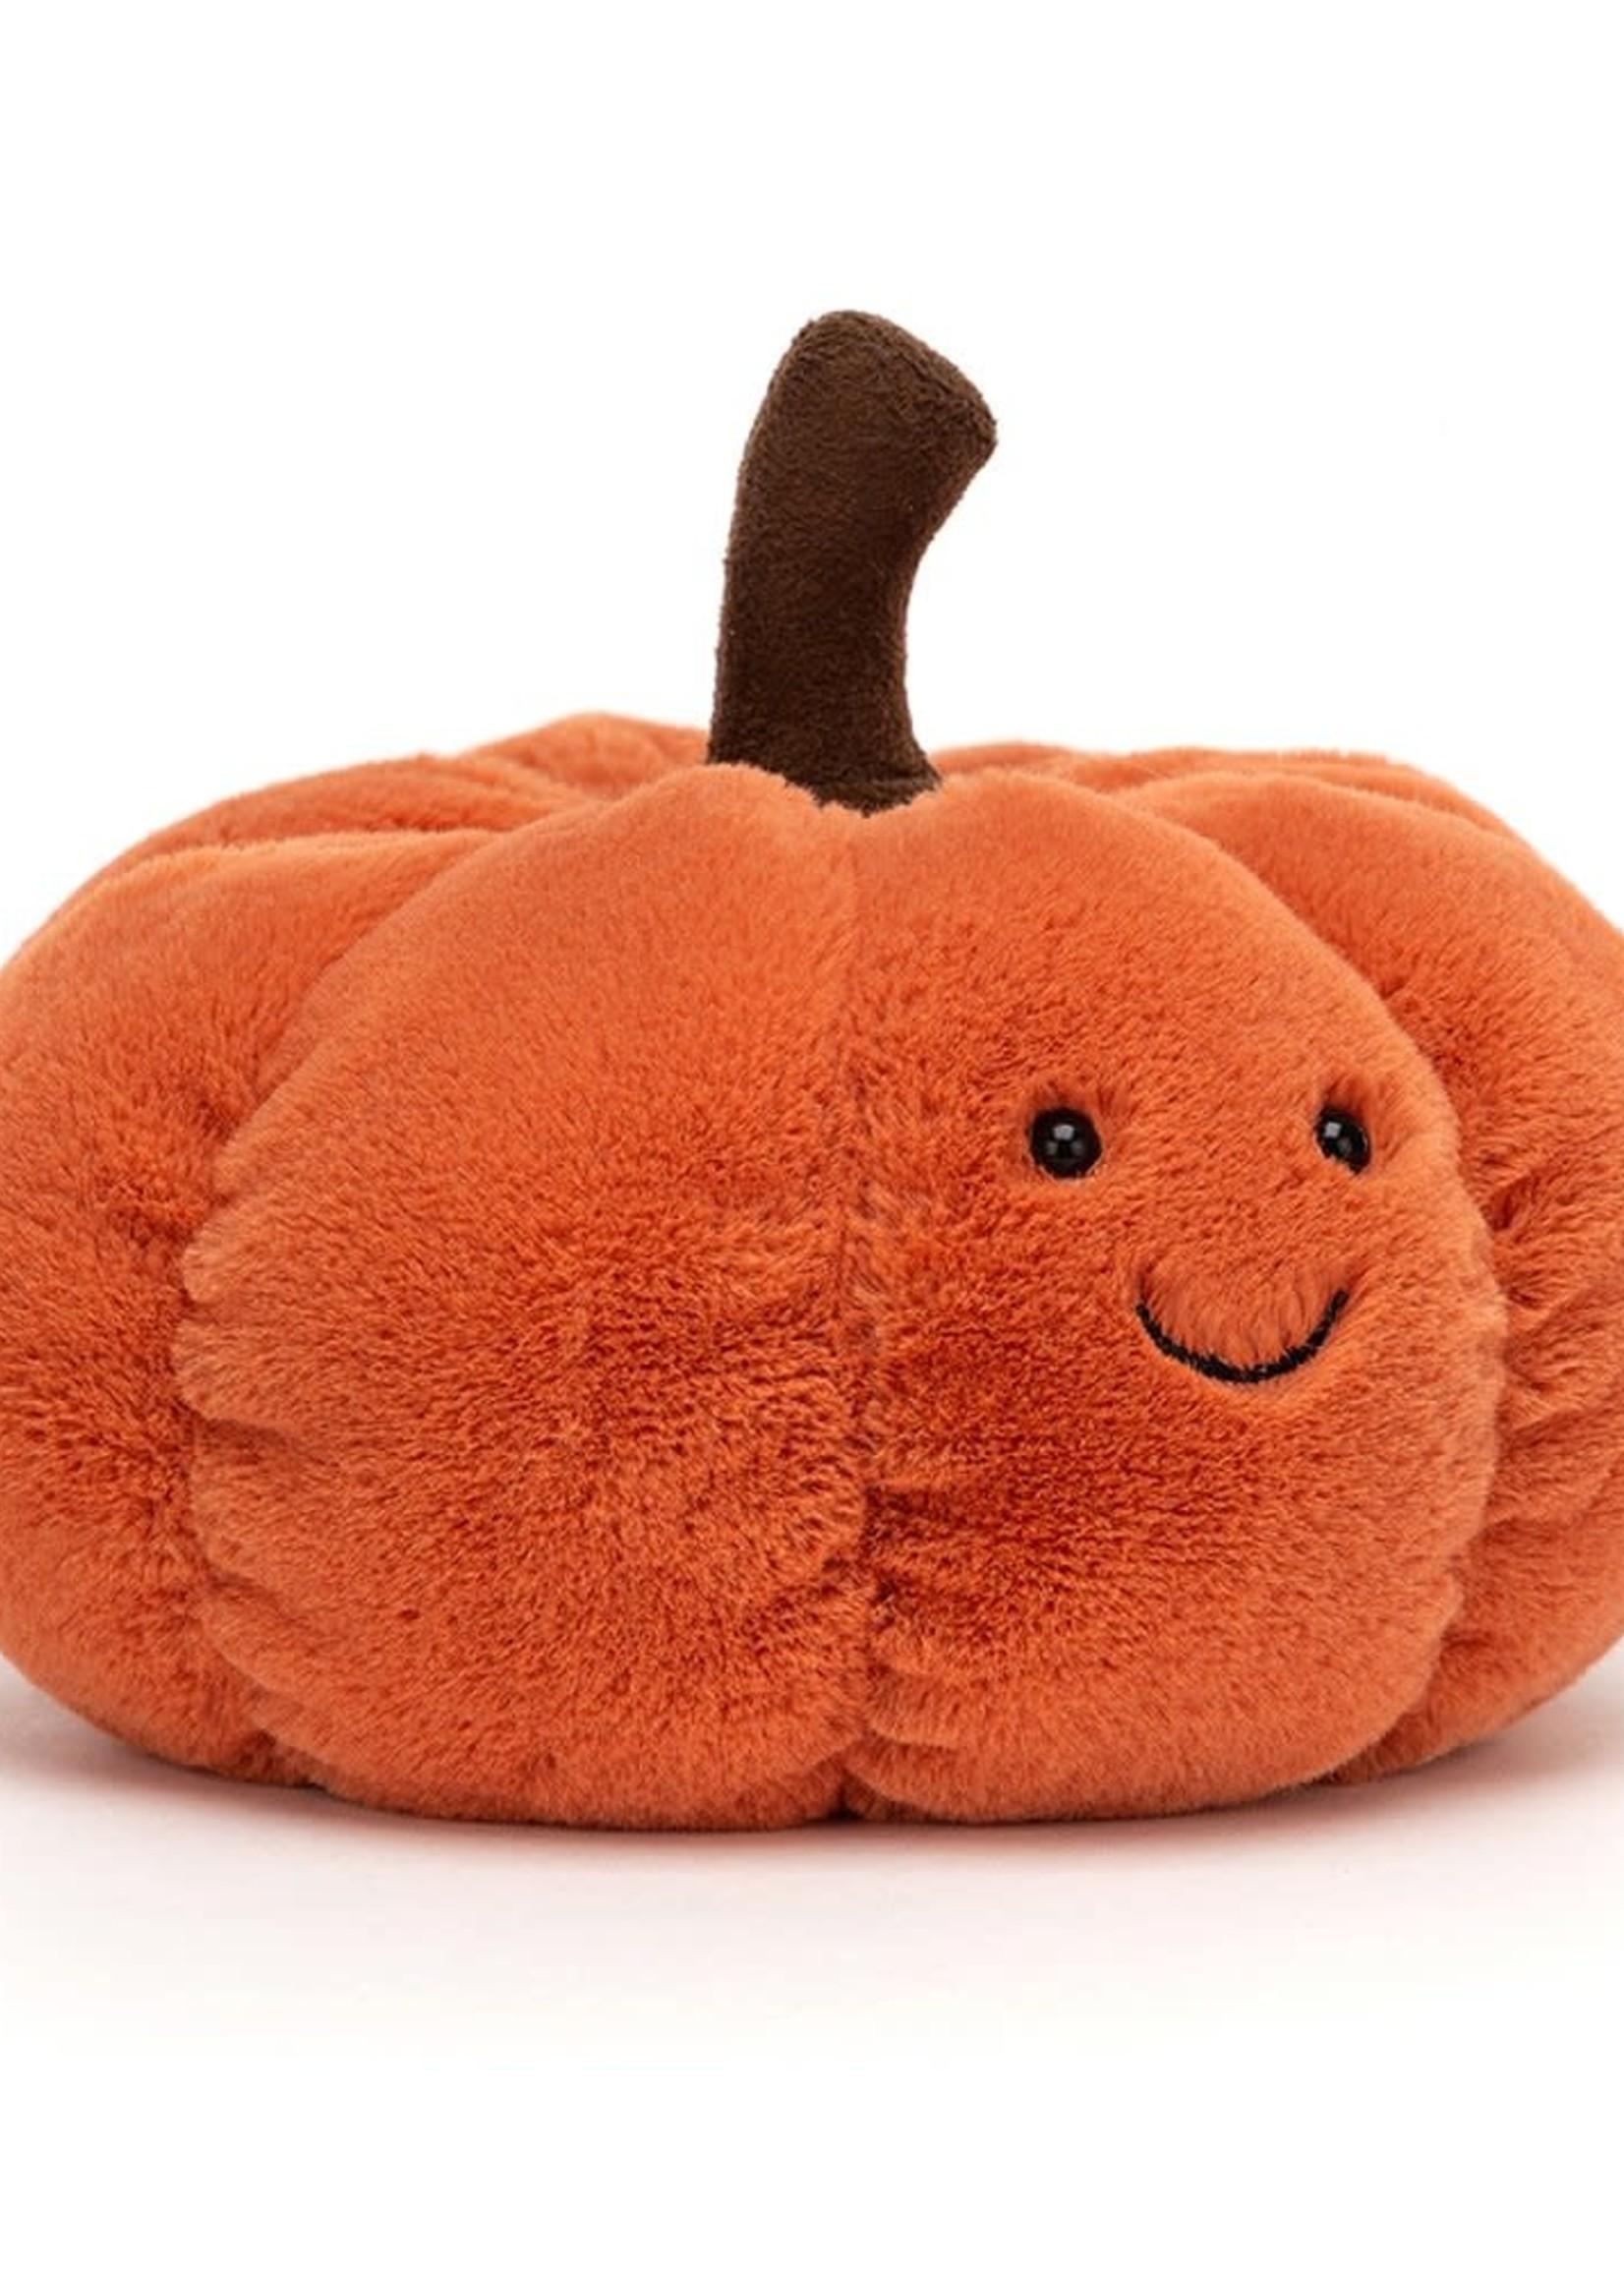 Jellycat JC Squishy Squash Orange